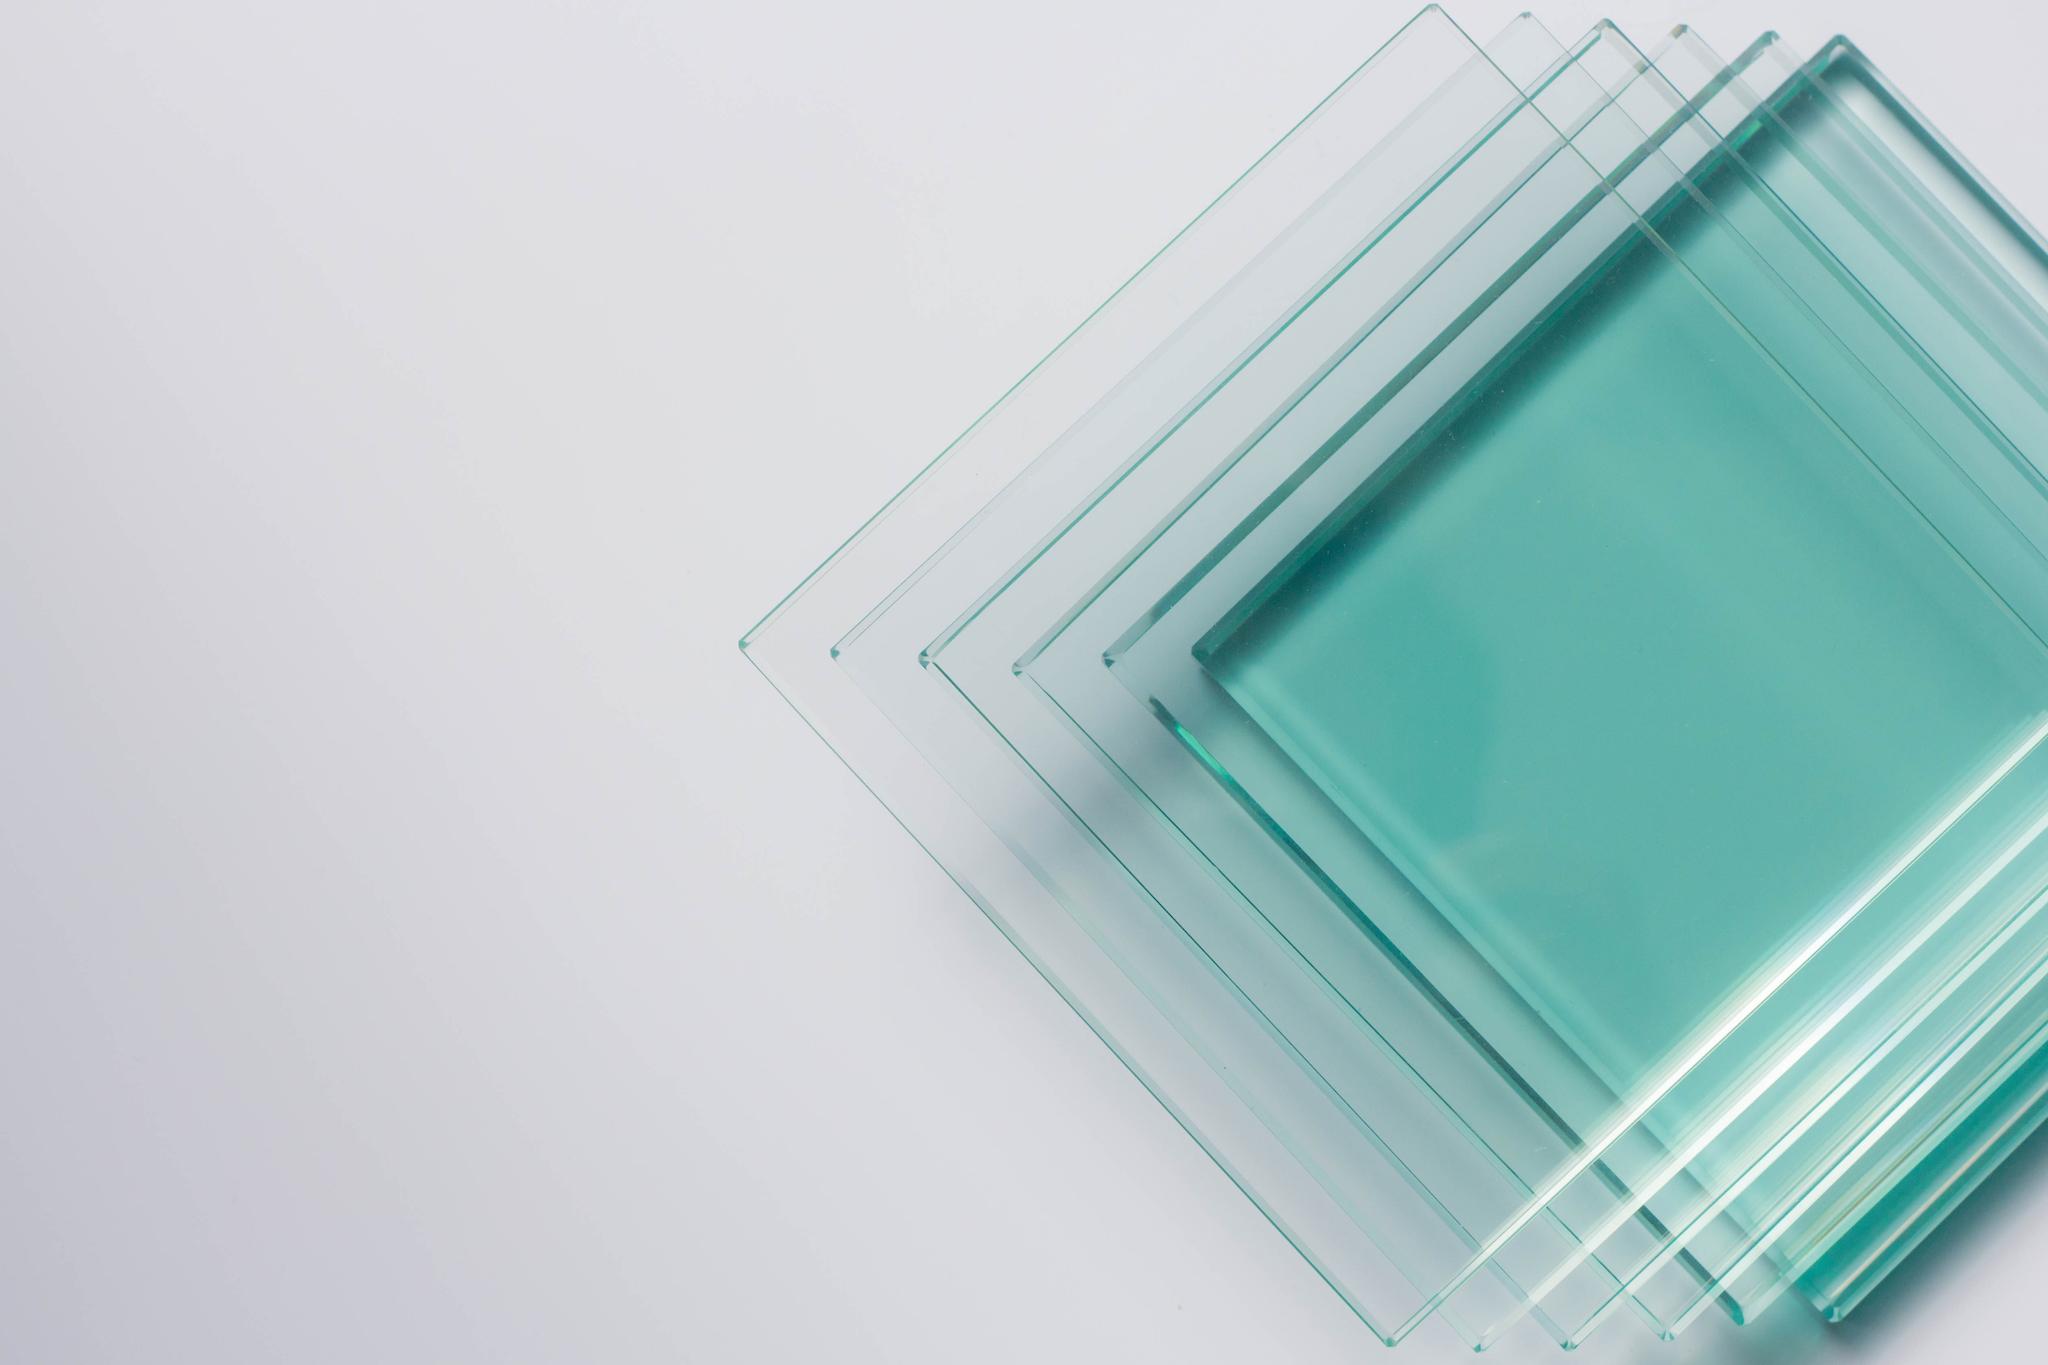 Project Silica: Datos almacenados en cristal